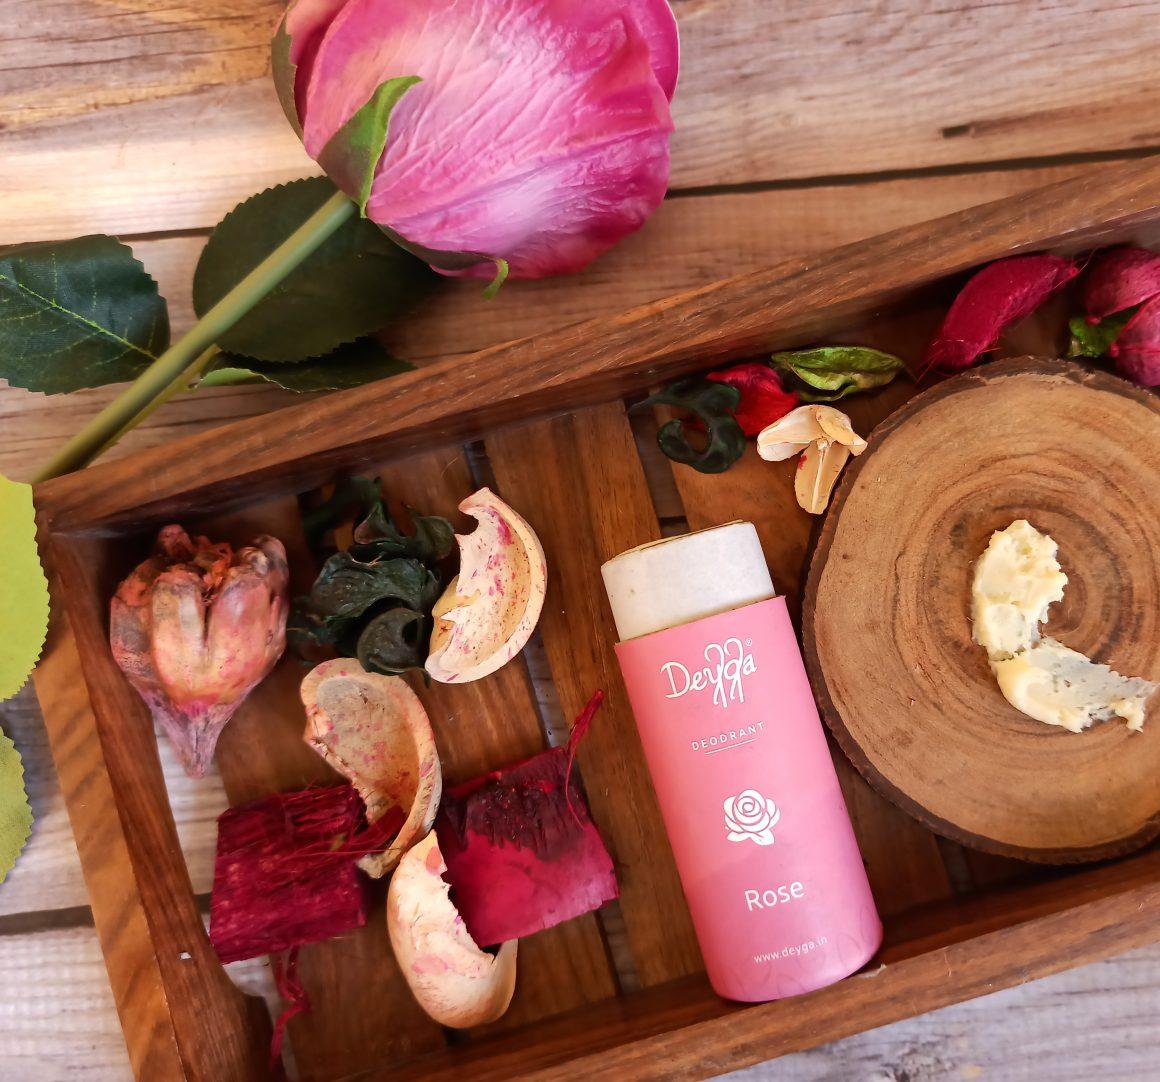 Deyga Organics Rose Deodorant